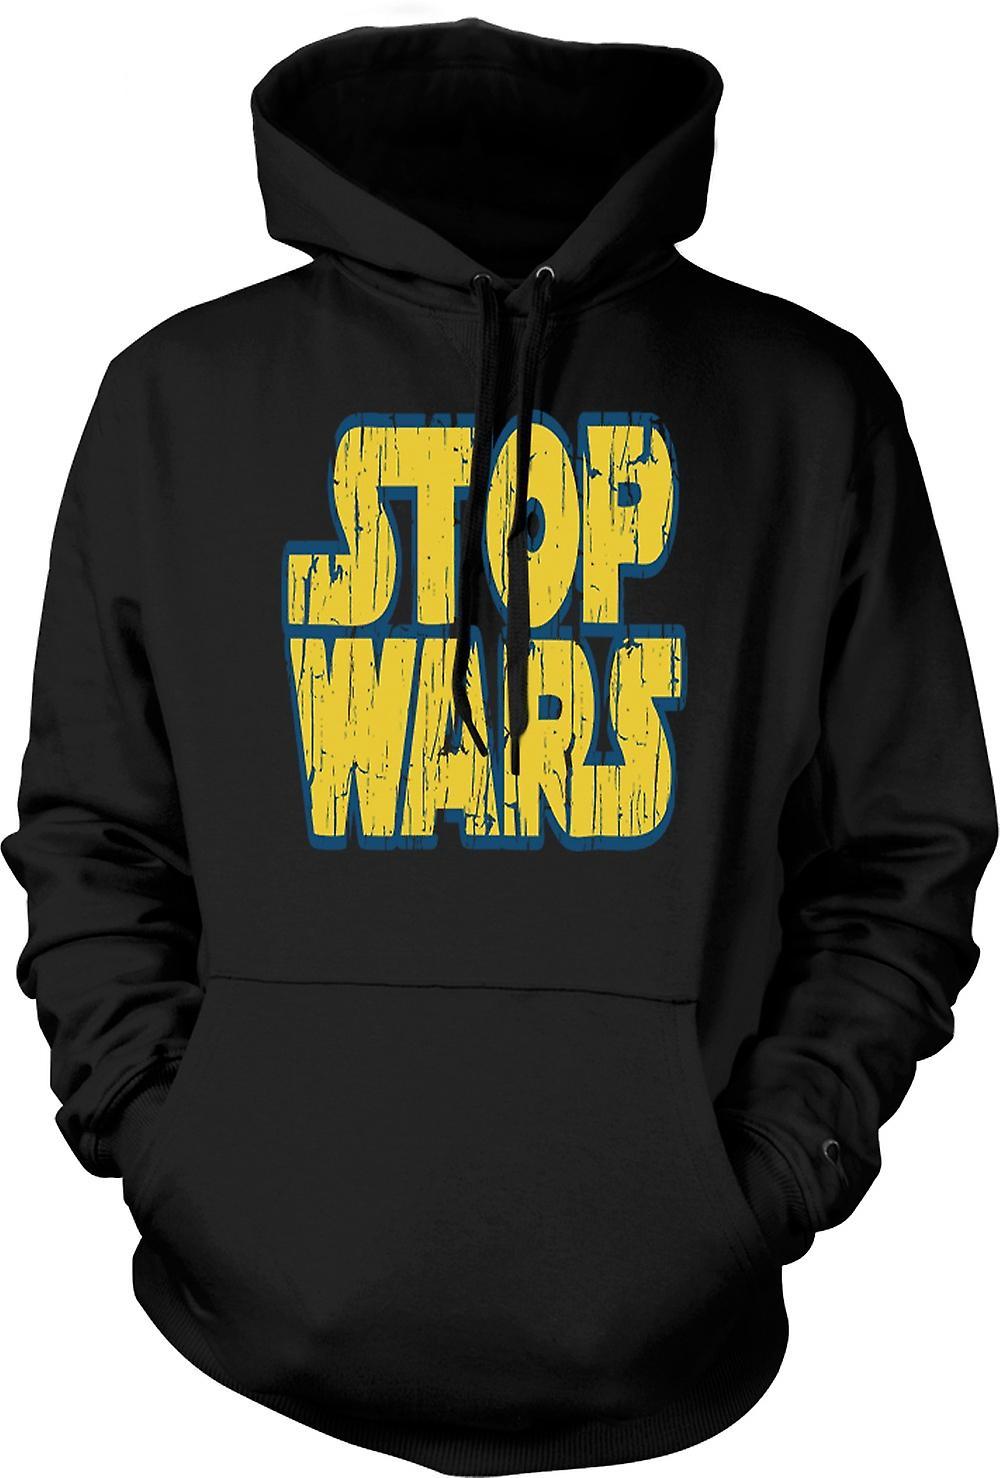 Mens Hoodie - Stop Wars (Star Wars) - Conspiracy - Funny